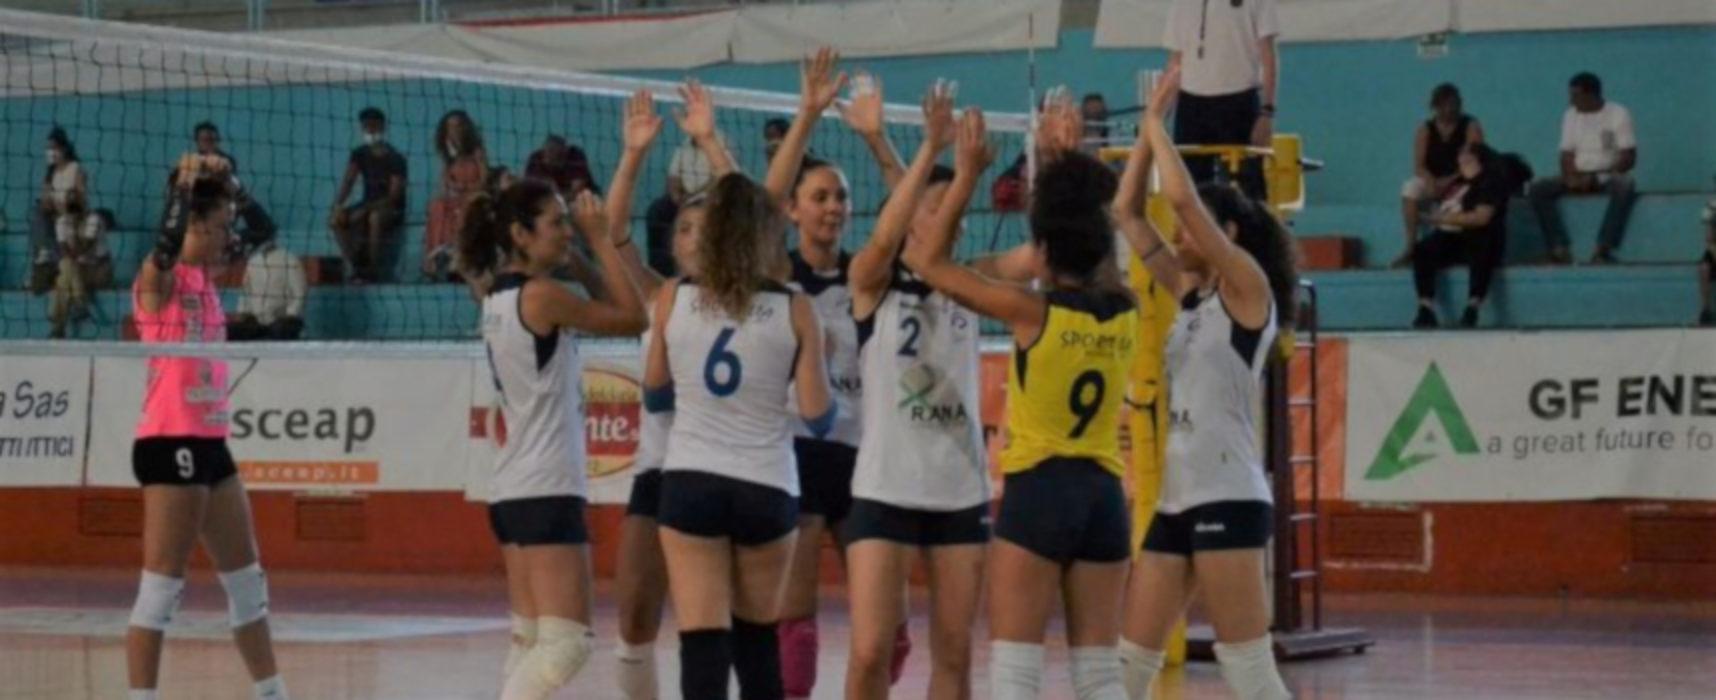 Sportilia vince un derby al cardiopalma e conquista la finale playoff